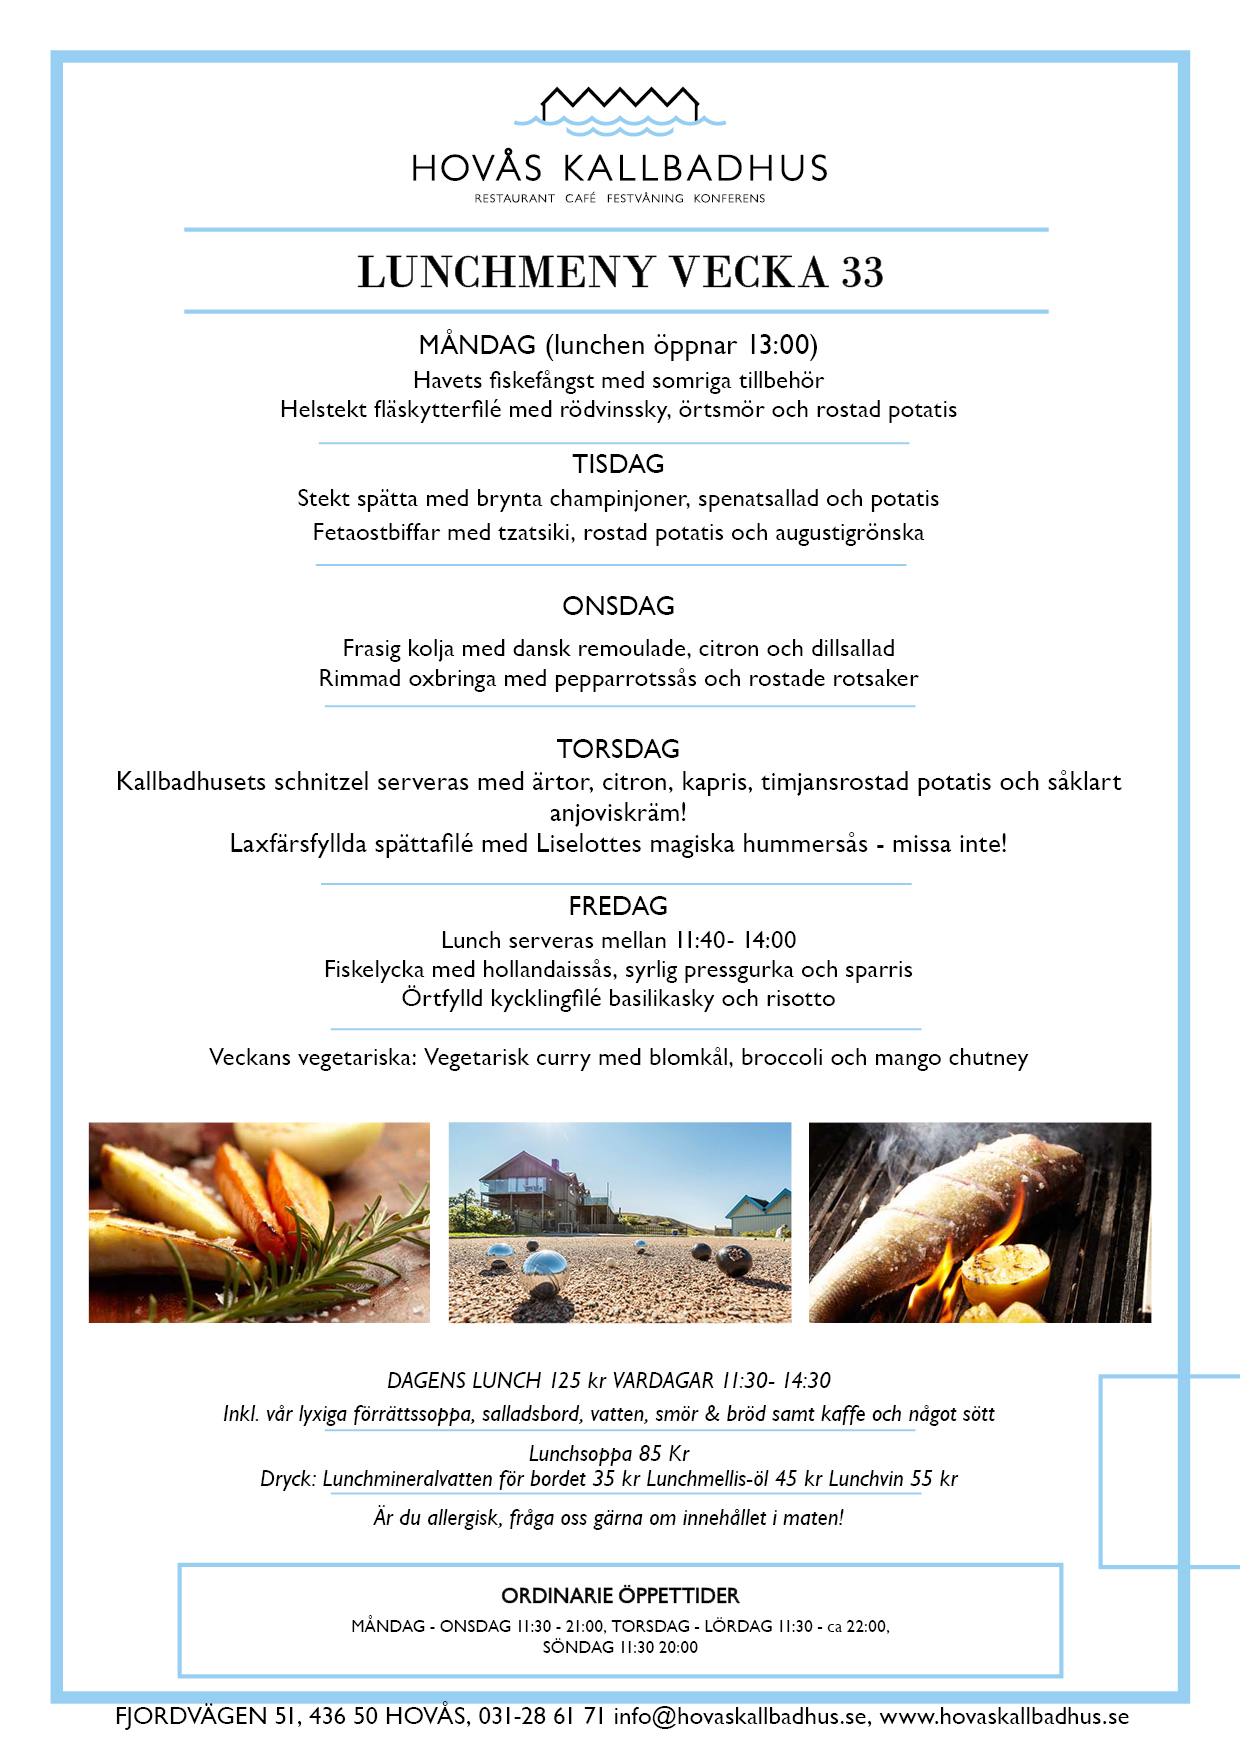 lunchmeny v33